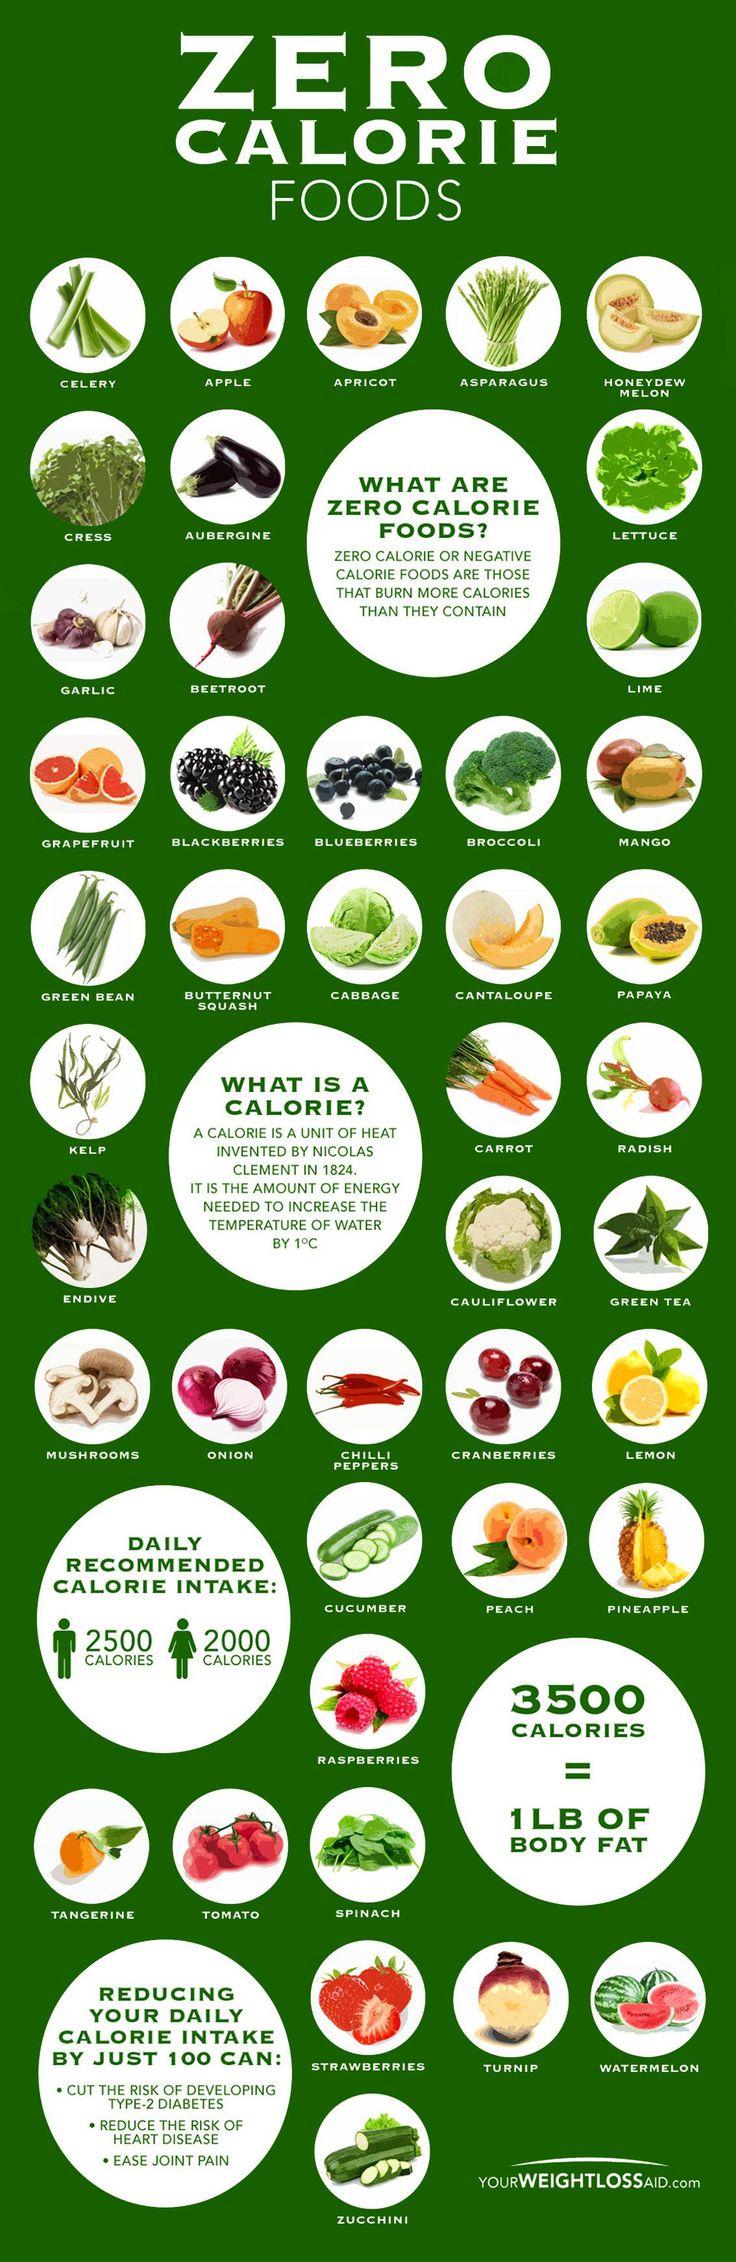 Zero Calorie Food Chart. Topic: diet, weight loss, paleo, nutrition, fruits, veg…